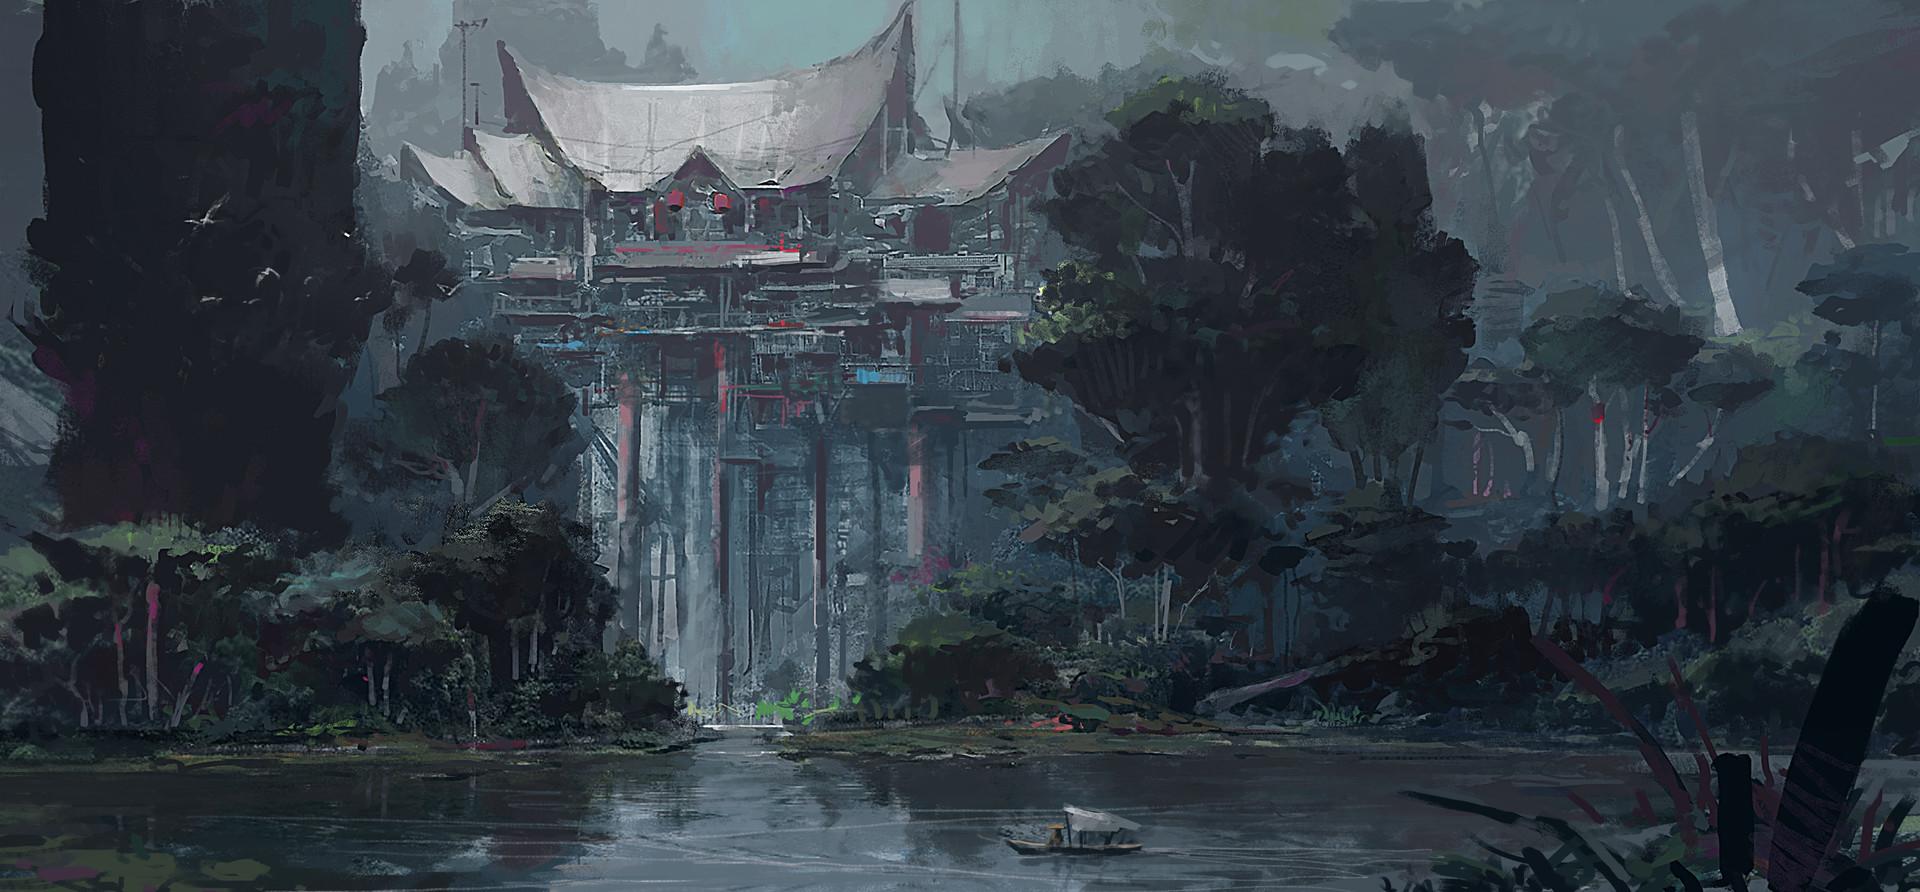 su-jian-180720.jpg